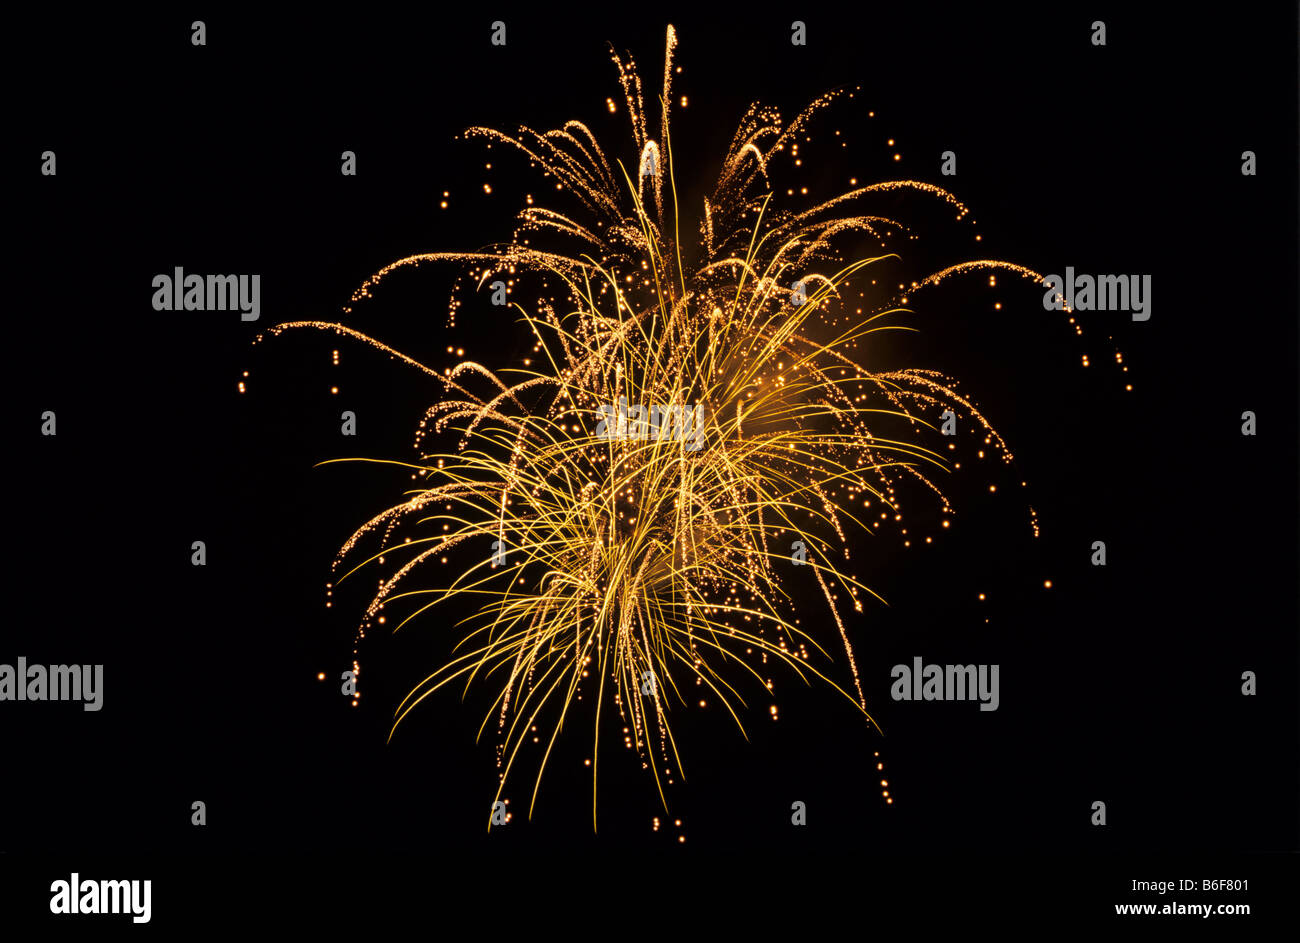 Firework - Stock Image